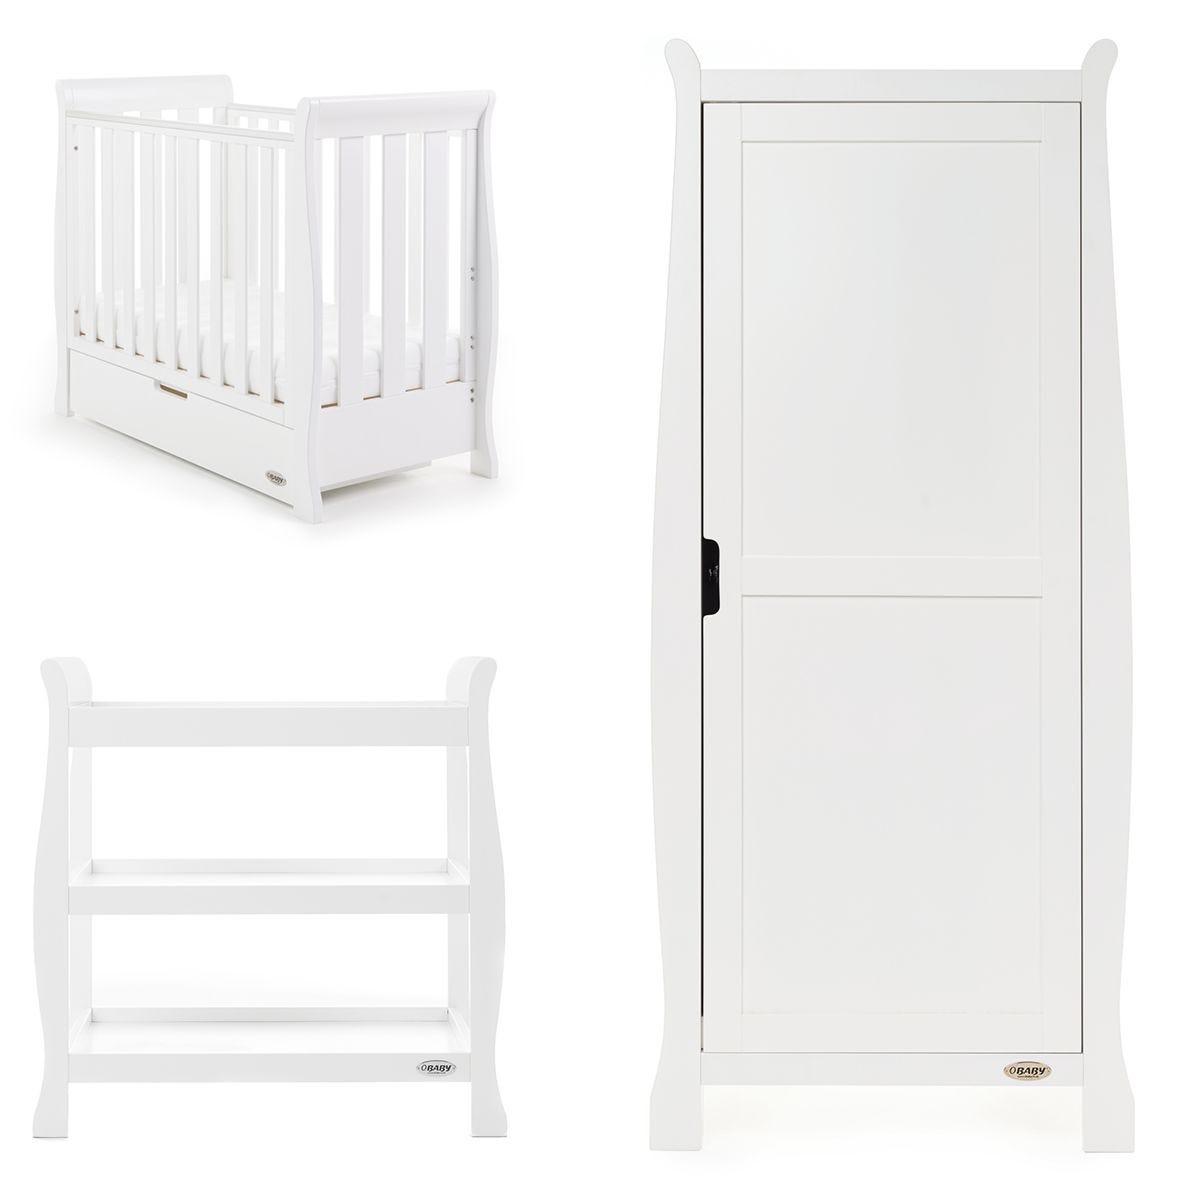 Obaby Stamford Space Saver Sleigh 3 Piece Room Set - White